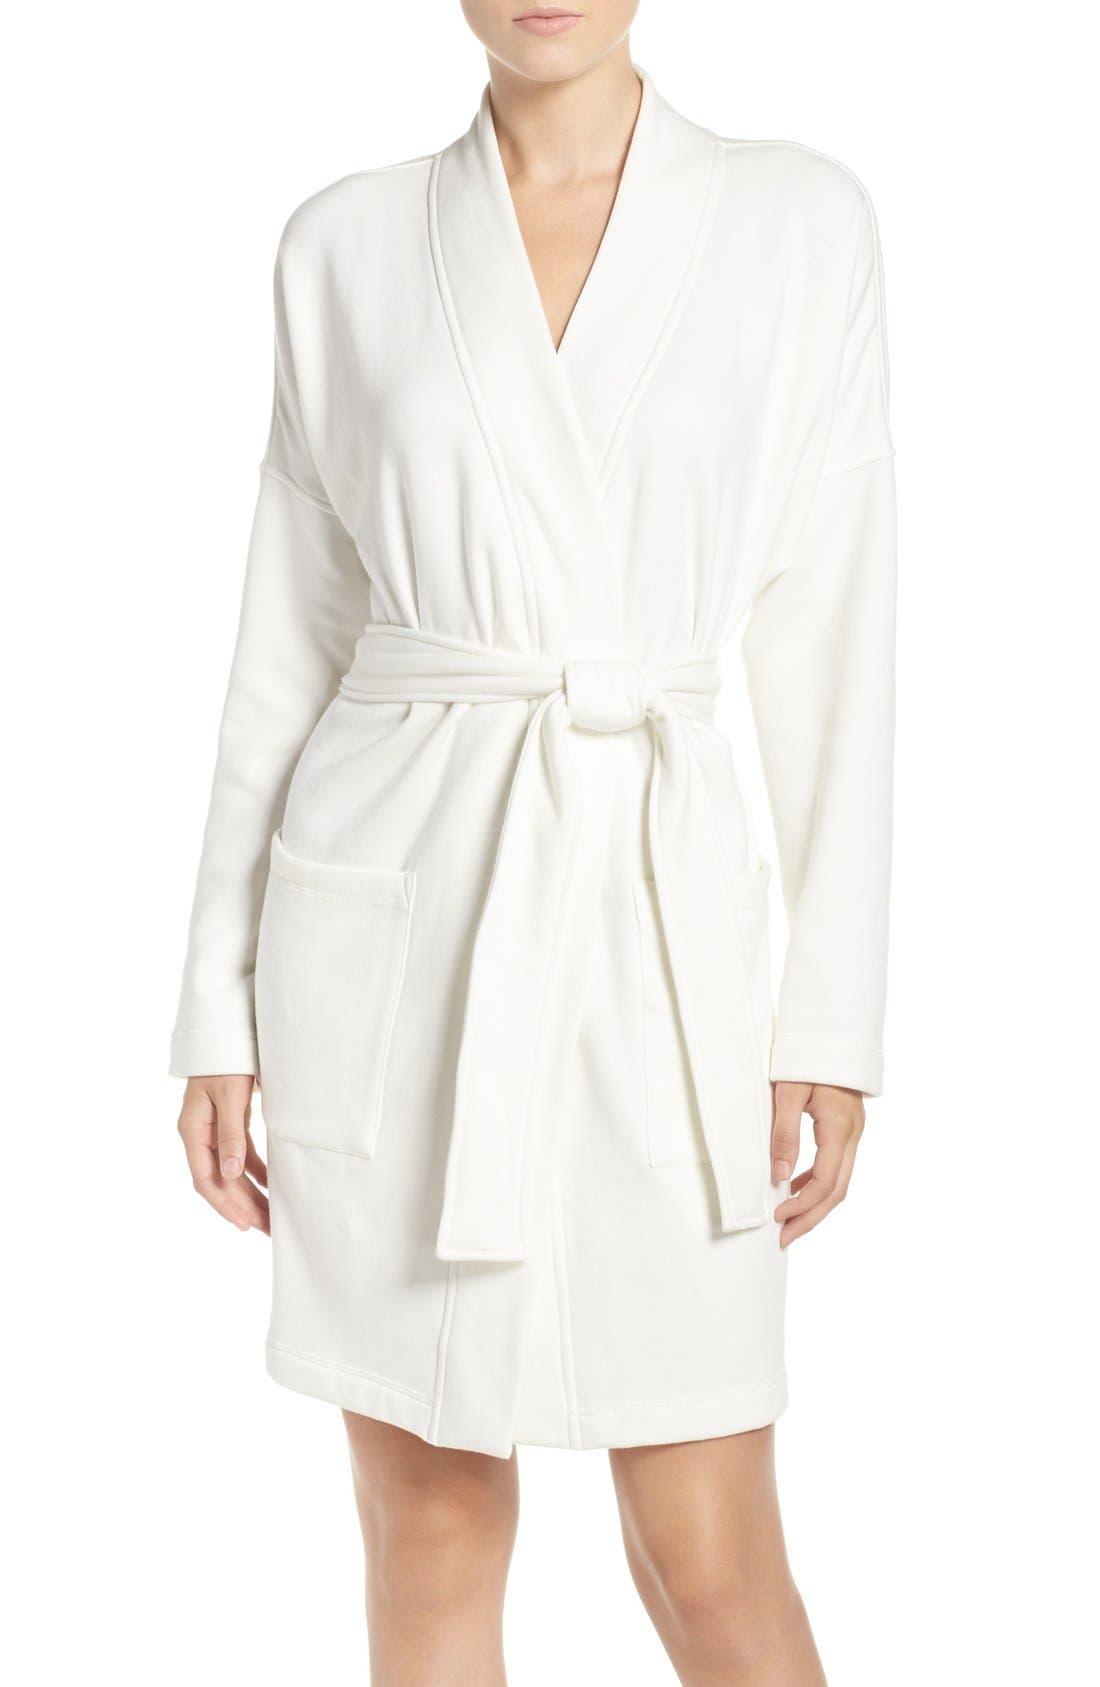 Alternate Image 1 Selected - UGG® 'Braelyn' Fleece Robe